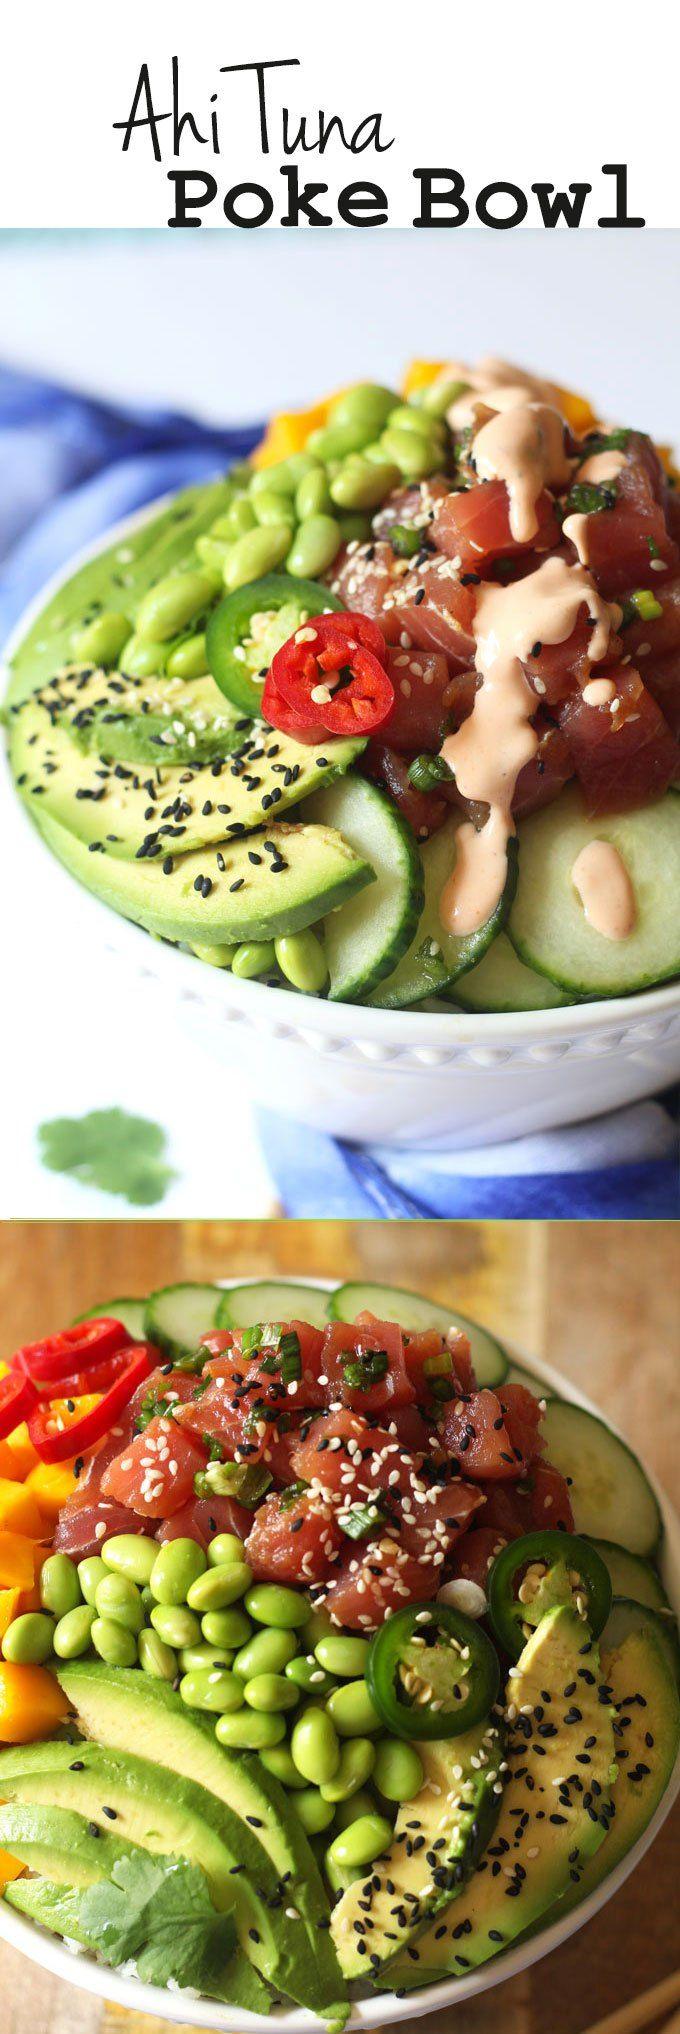 Best 25 tuna poke ideas on pinterest poki bowl near me for Sushi grade fish near me